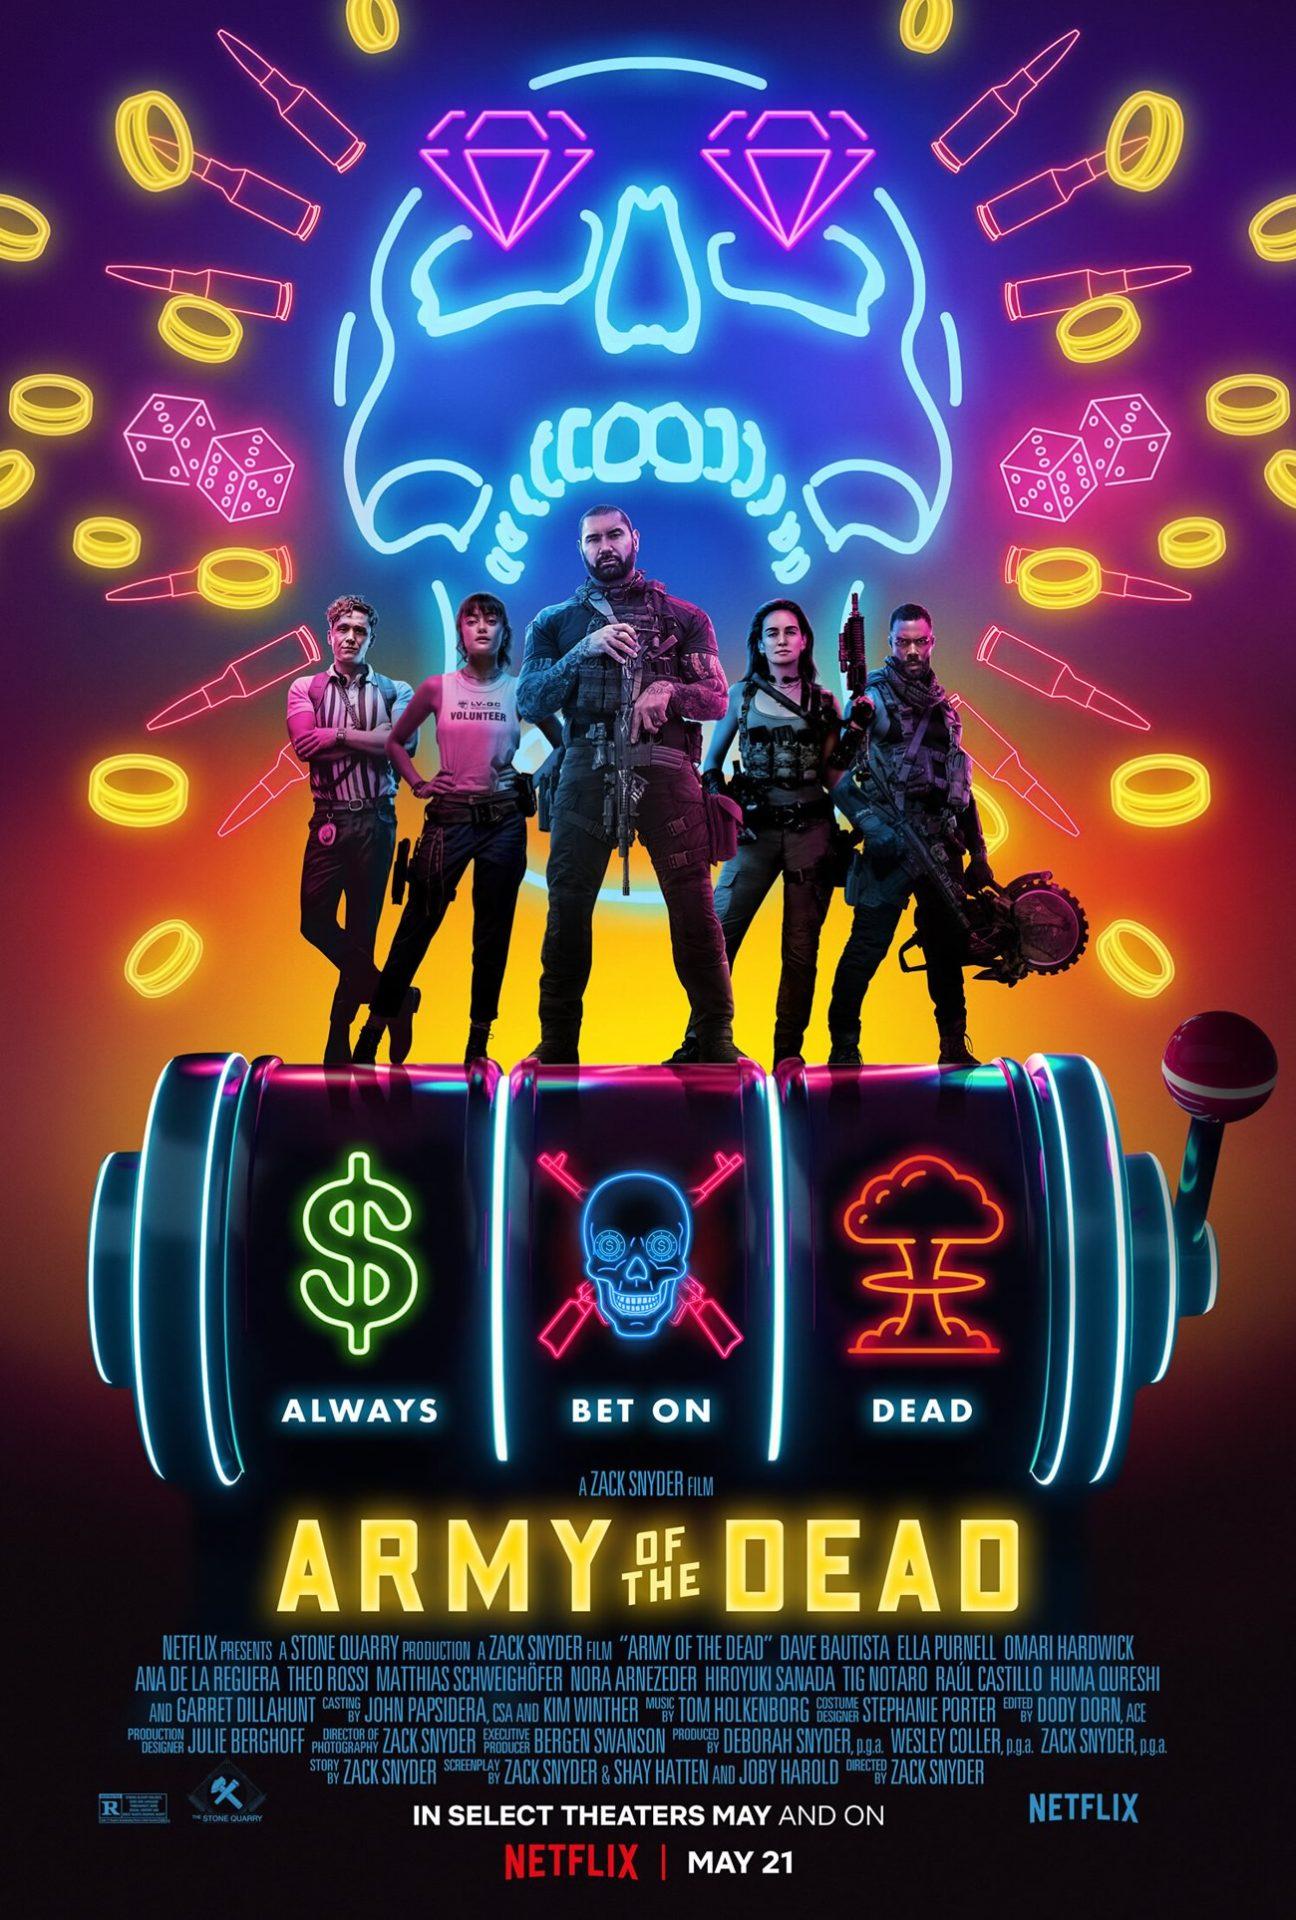 army of the dead invasao em las vegas zack snyder compartilha poster estilo neon filme de zumbis - ARMY OF THE DEAD: Invasão em Las Vegas | Zack Snyder compartilha pôster em estilo Neon do seu filme de zumbis